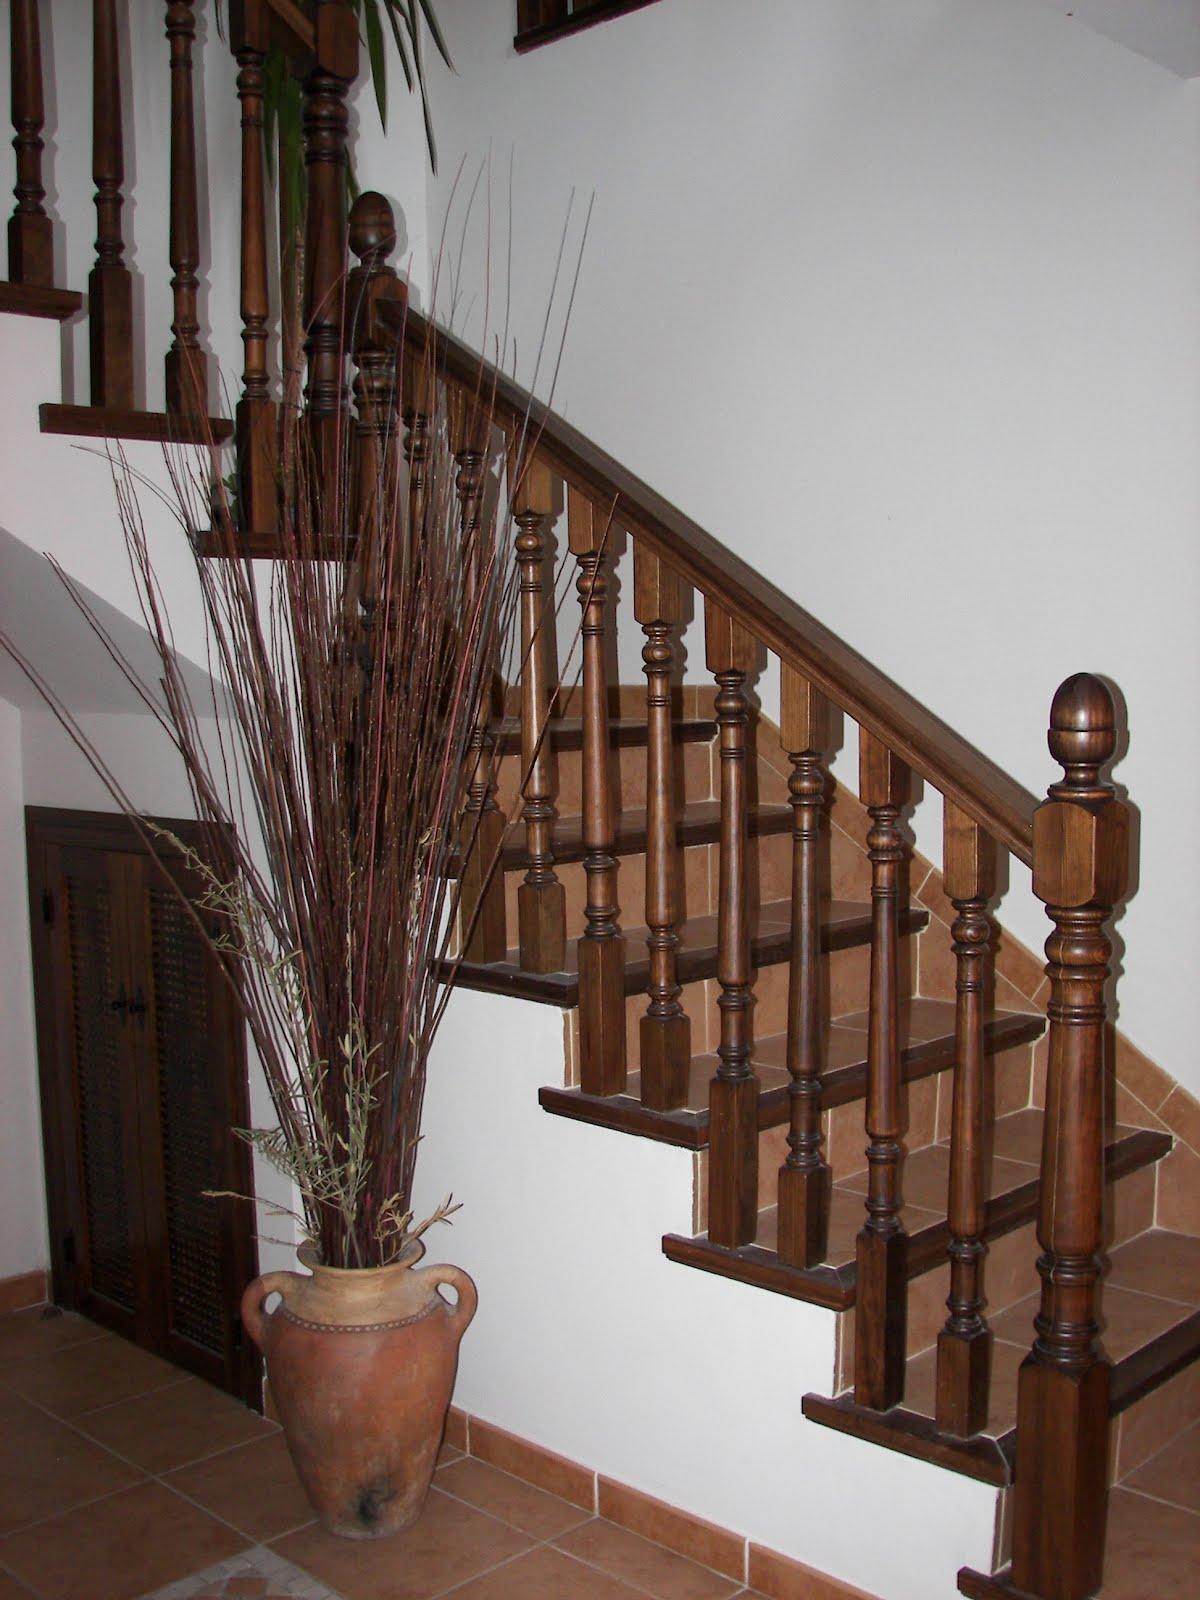 Barandas pasamanos y pilares de madera para escaleras balcones - Barandas de escaleras de madera ...